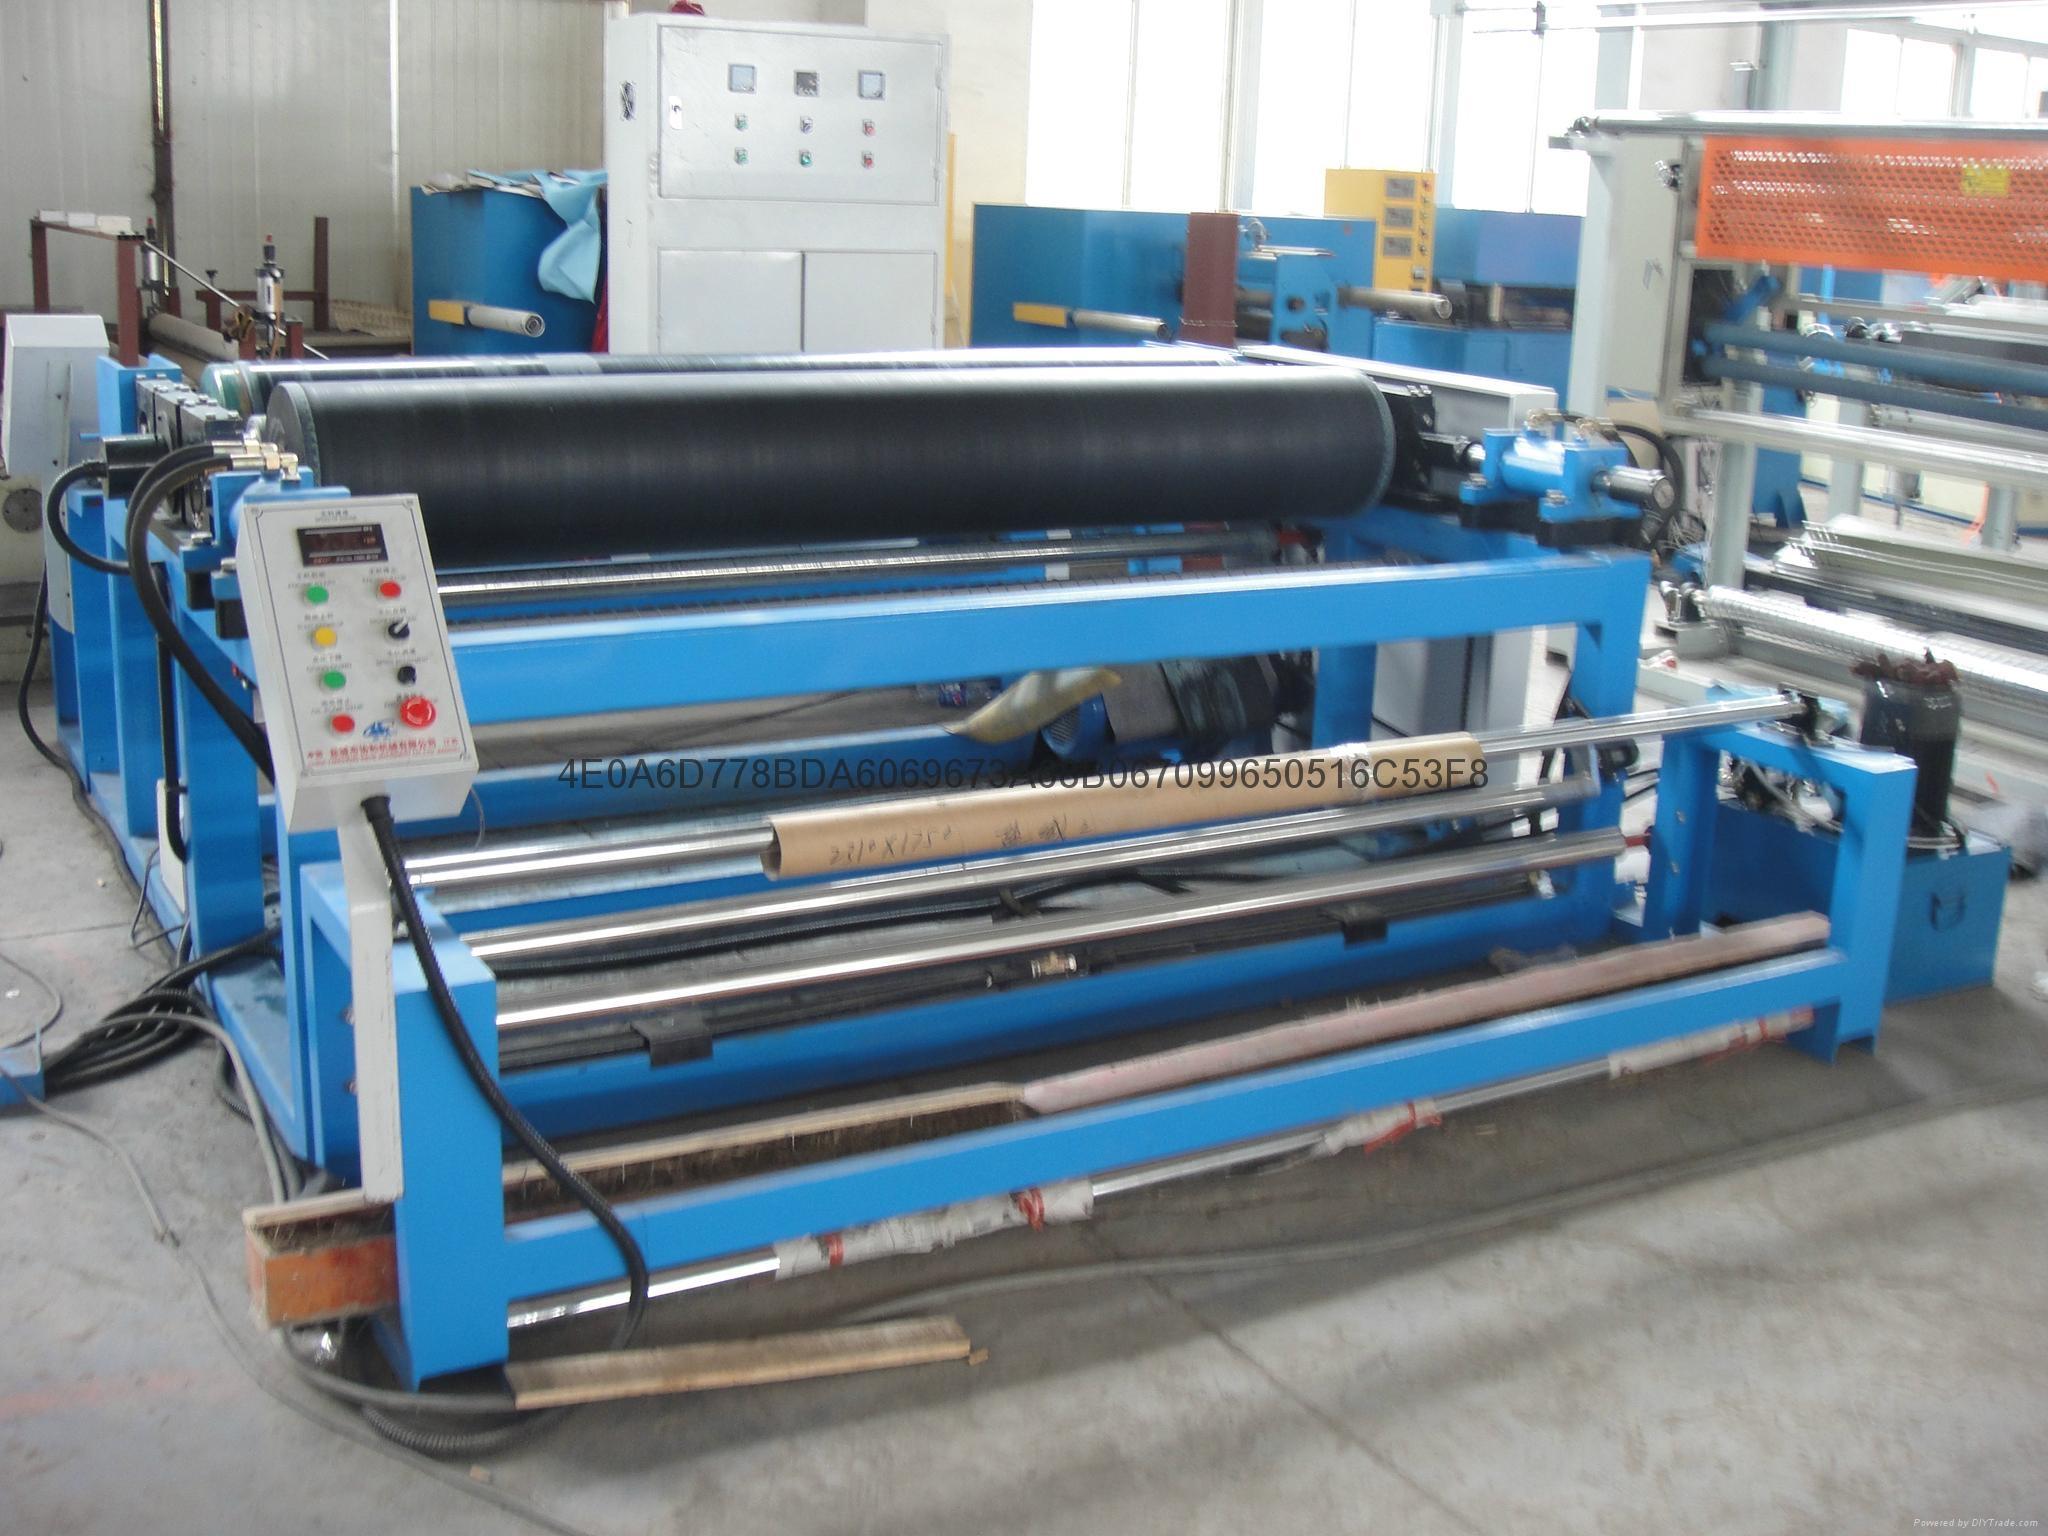 Sandpaper compound machine 4